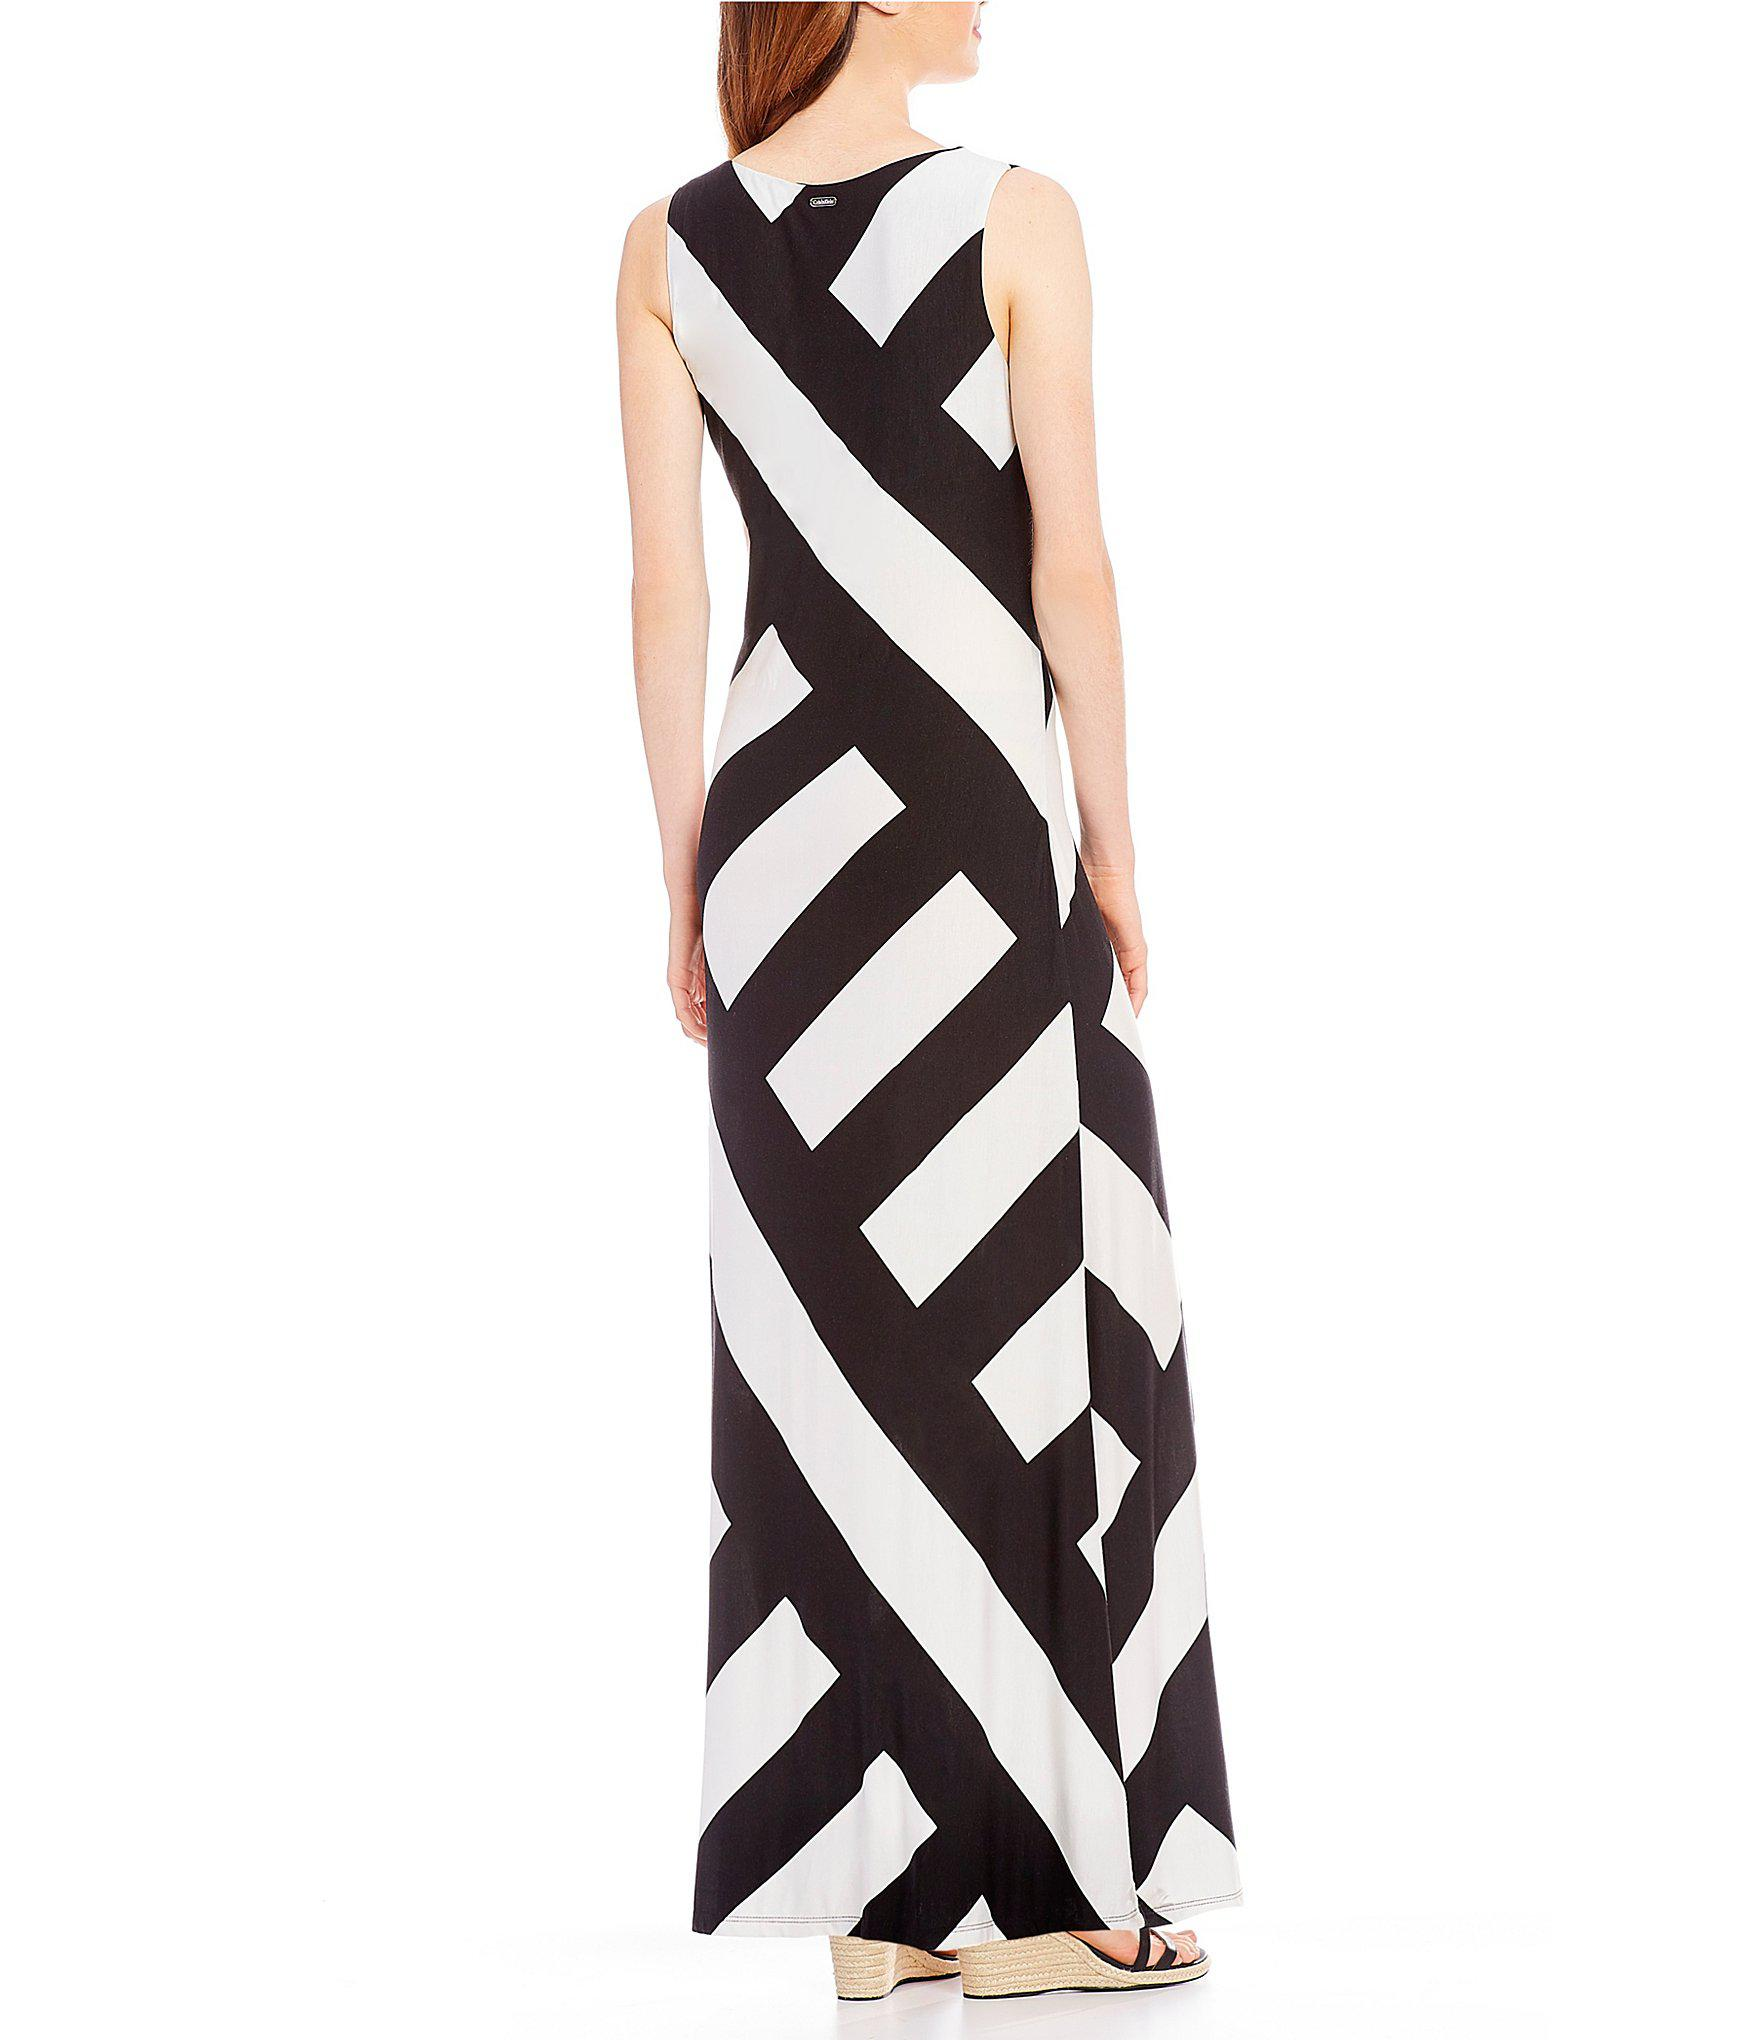 e45506b2f5 Calvin Klein Geometric Patch Stripe Knit Jersey V-neck Maxi Dress in ...